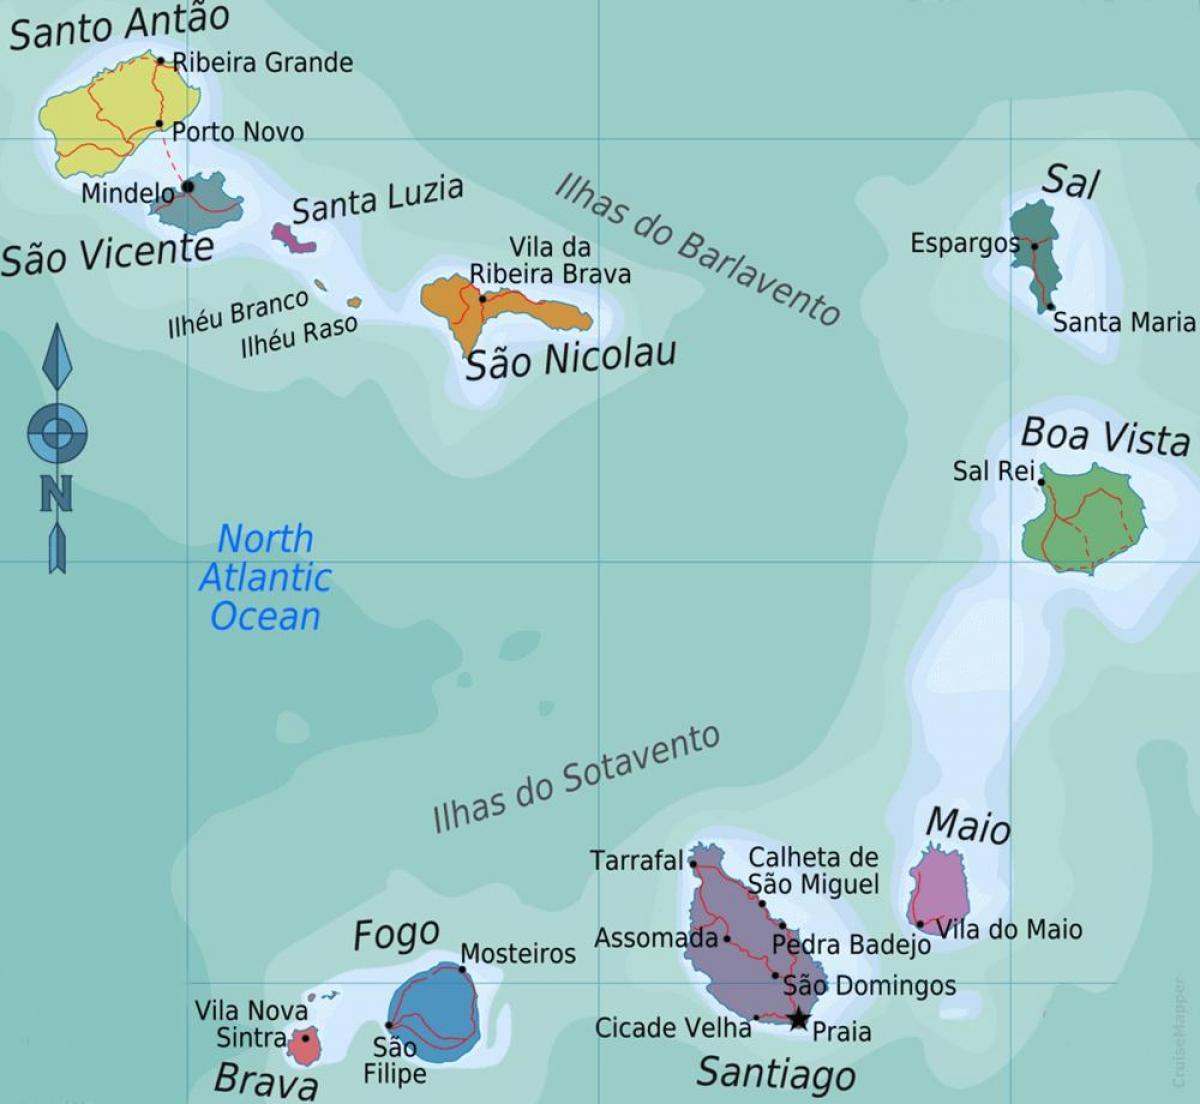 Karte Anzeigen.Boa Vista Kap Verde Karte Karte Boa Vista Kap Verde